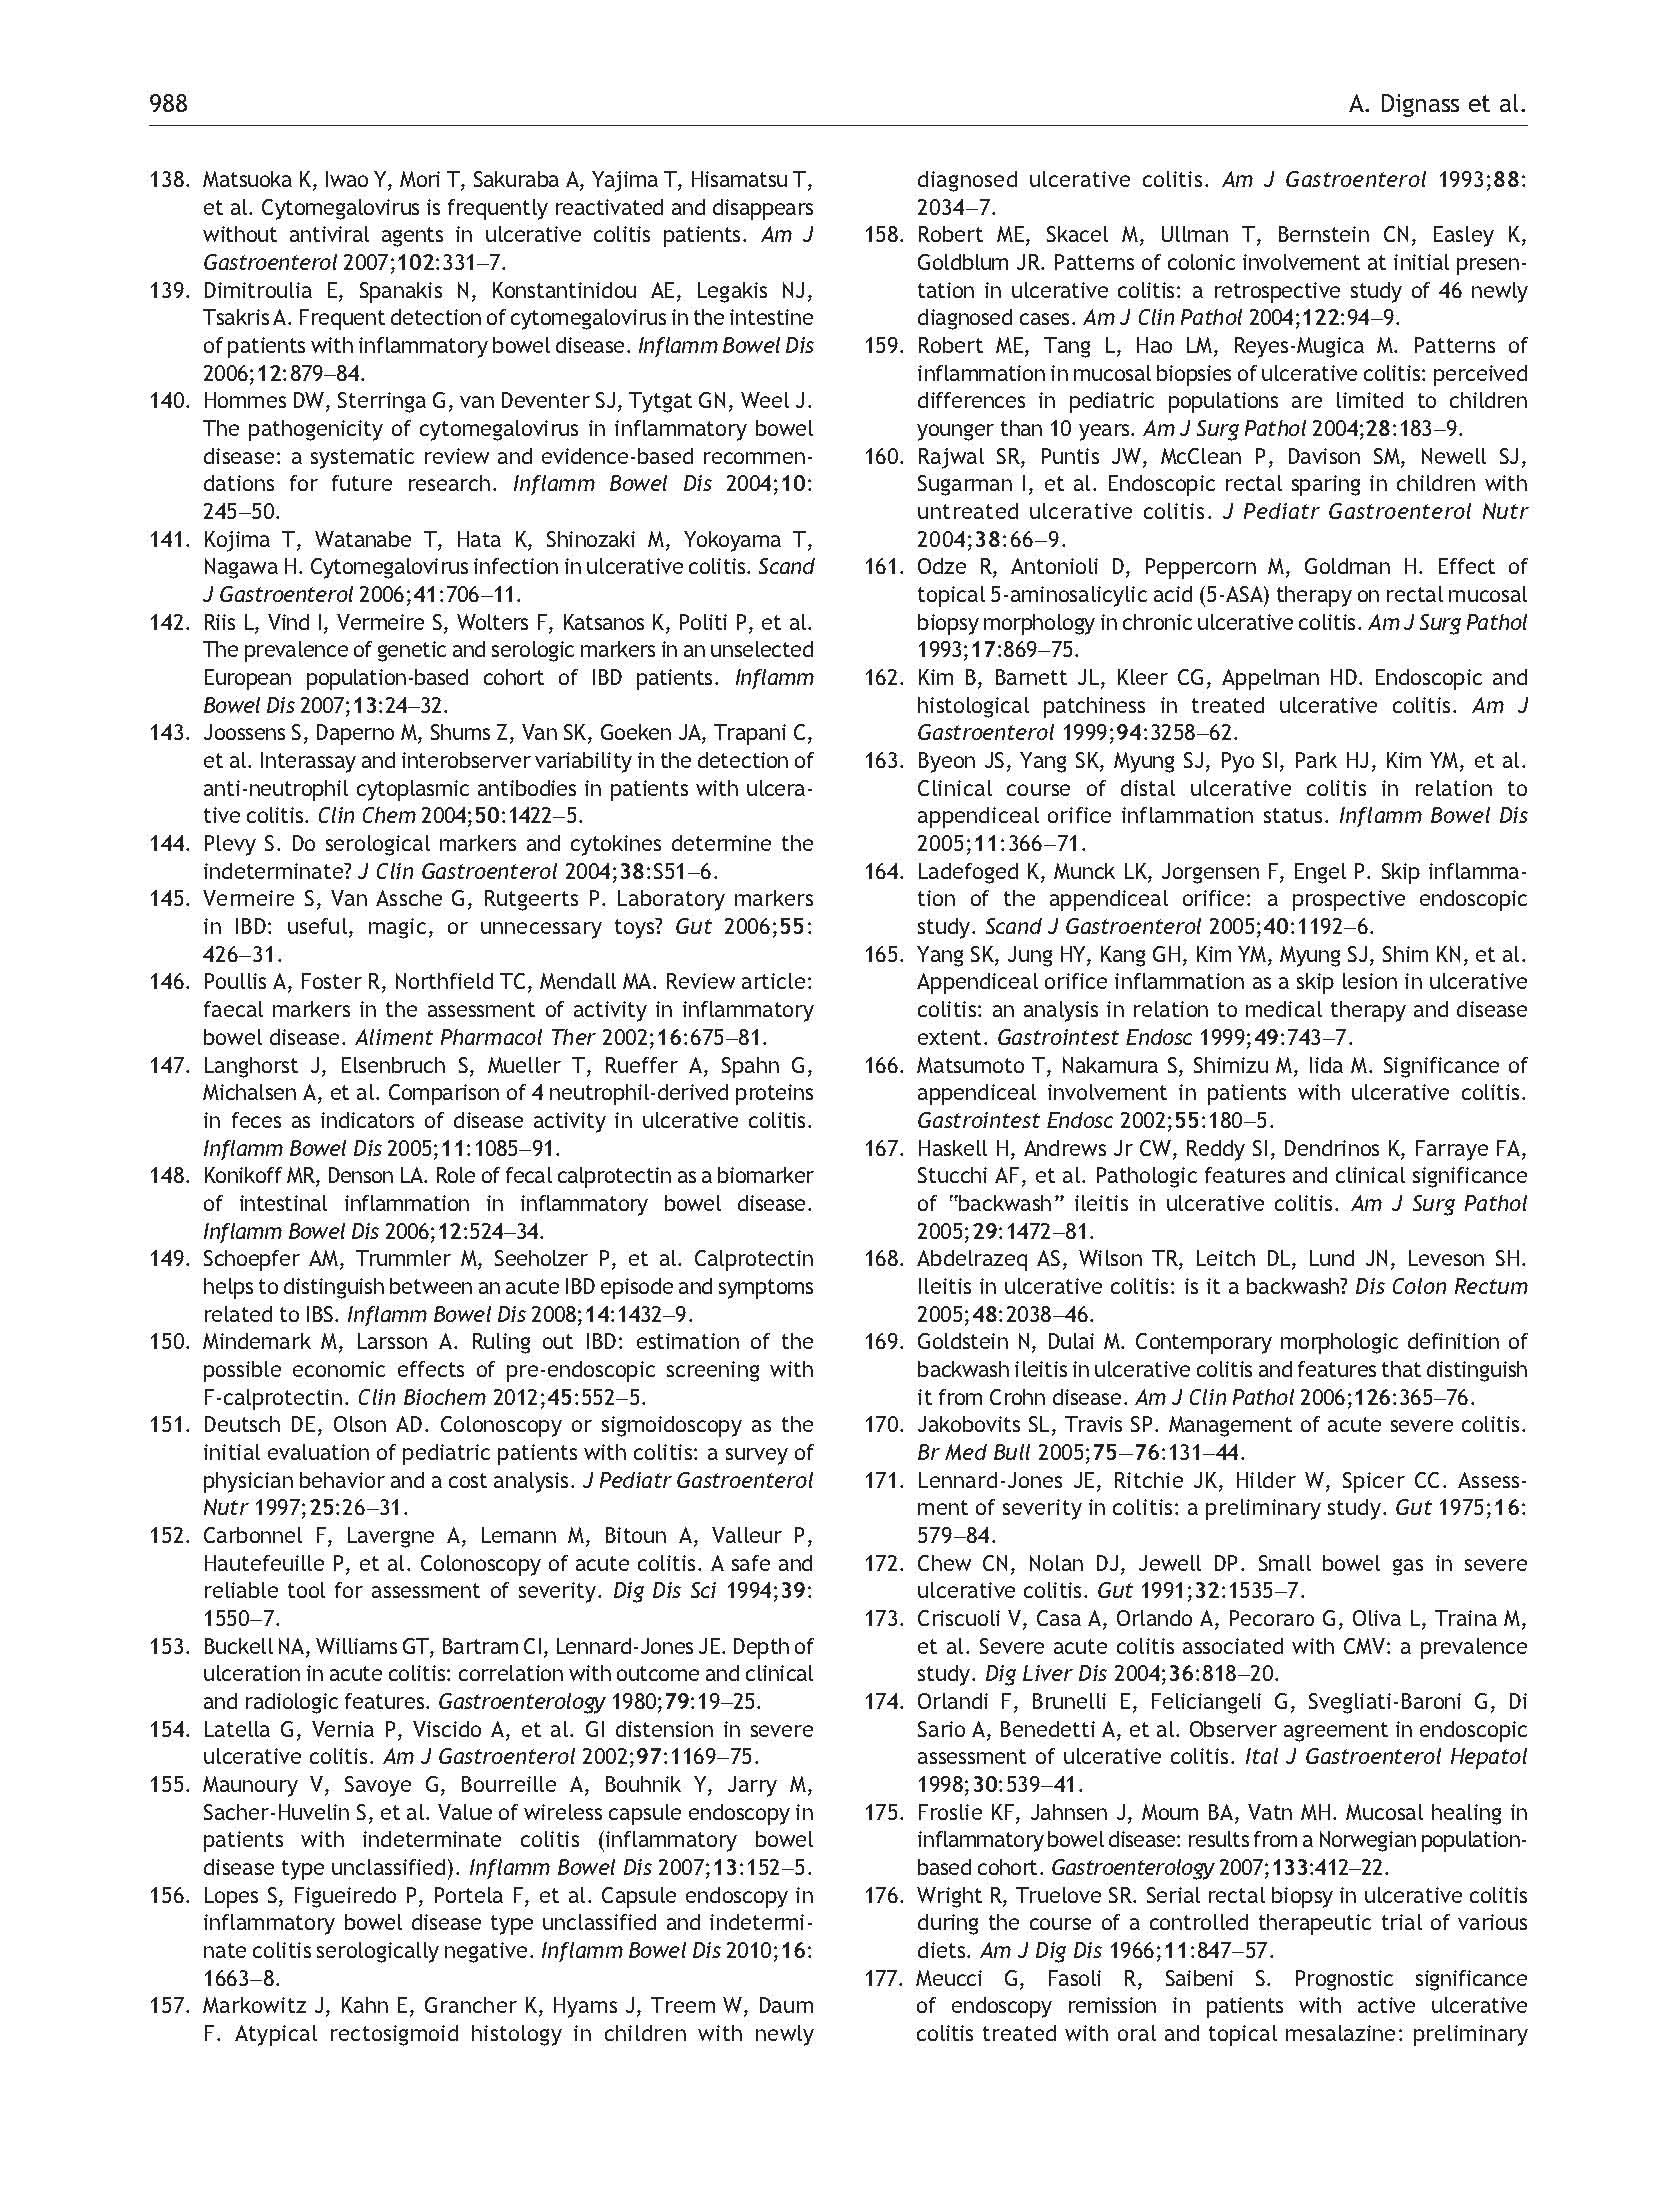 2012-ECCO第二版-欧洲询证共识:溃疡性结肠炎的诊断和处理—定义与诊断_页面_24.jpg